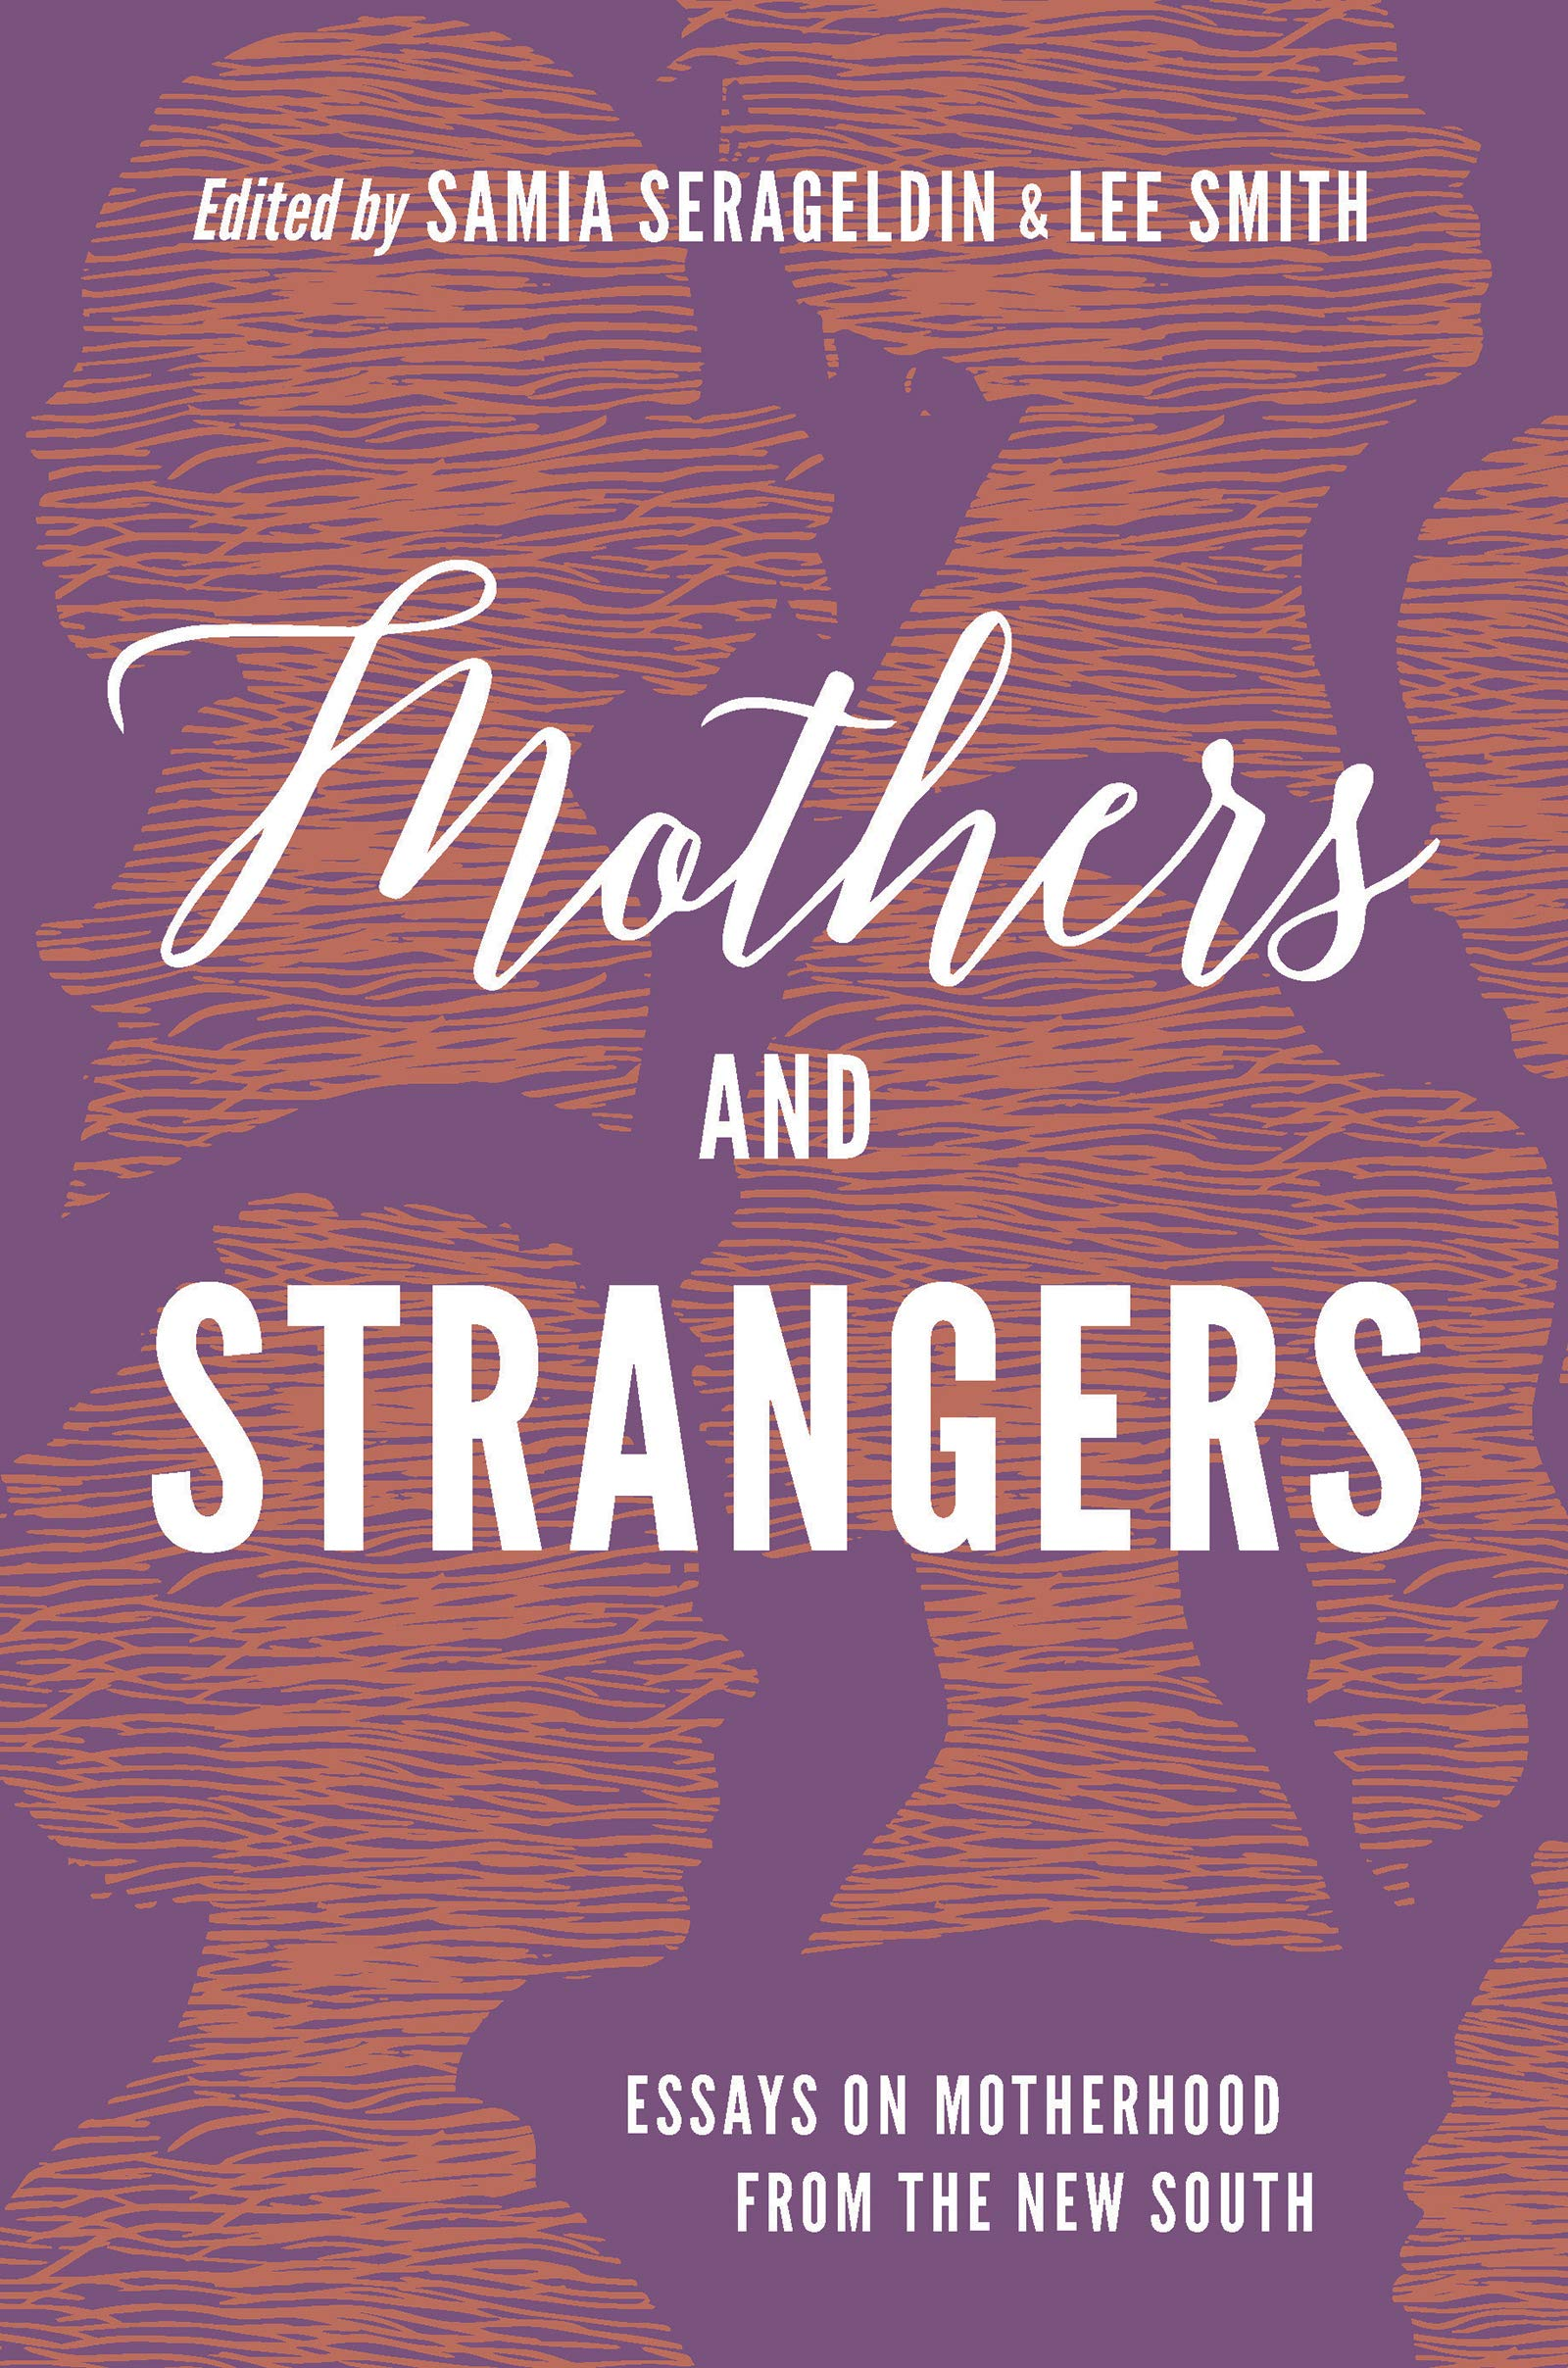 Mothers And Strangers Essays On Motherhood From The New South  Mothers And Strangers Essays On Motherhood From The New South Samia  Serageldin Lee Smith  Amazoncom Books